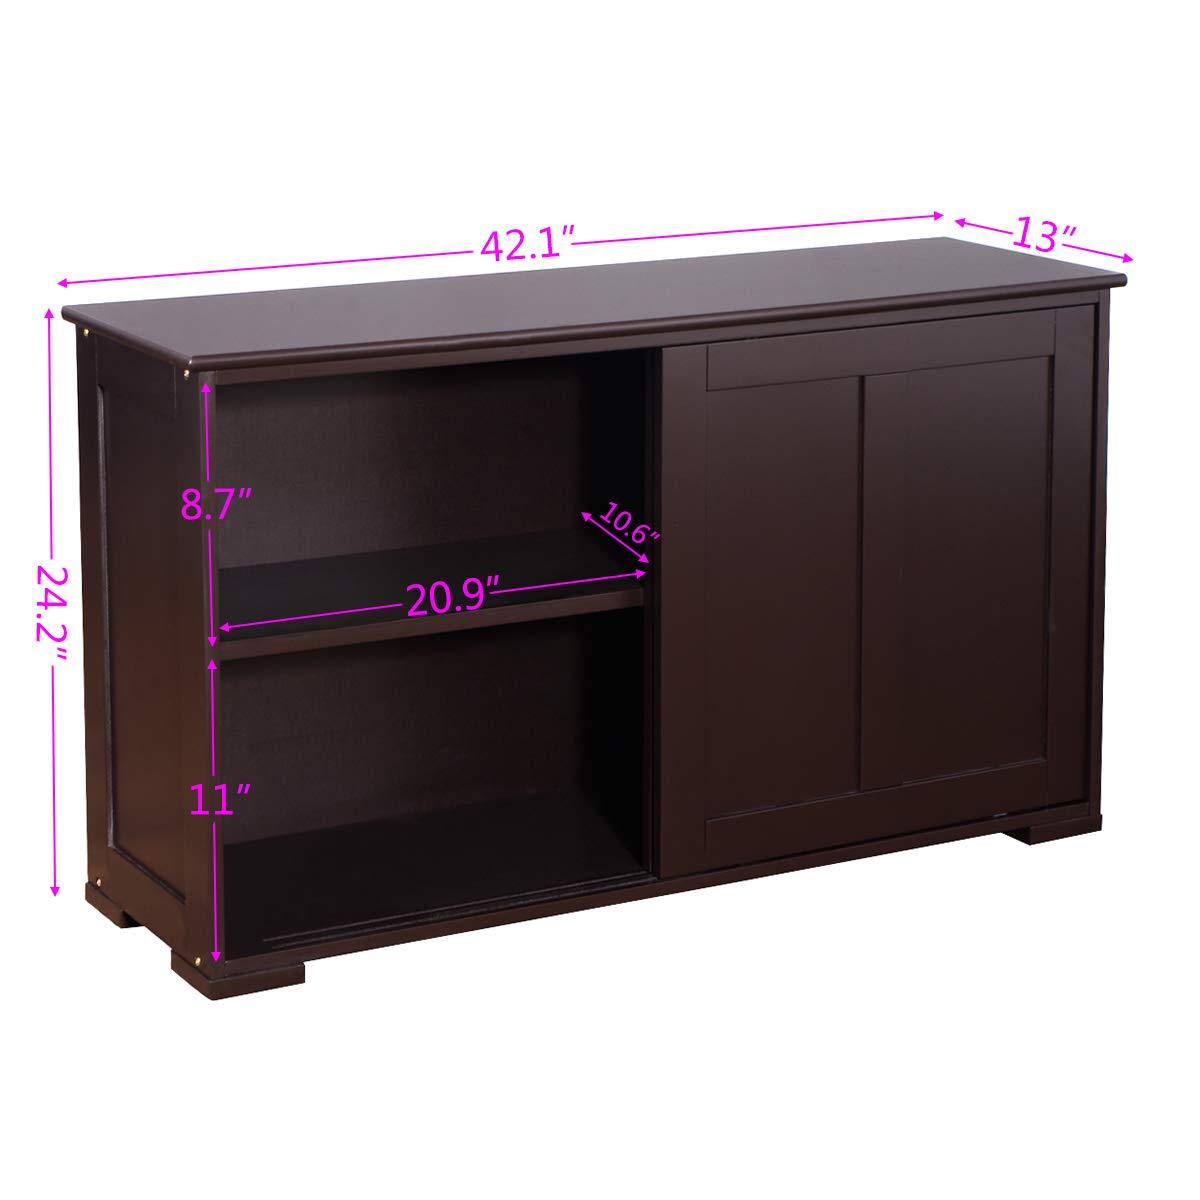 WATERJOY Kitchen Storage Sideboard, Stackable Buffet Storage Cabinet with Sliding Door Panels for Home Kitchen, Antique Brown by WATERJOY (Image #6)